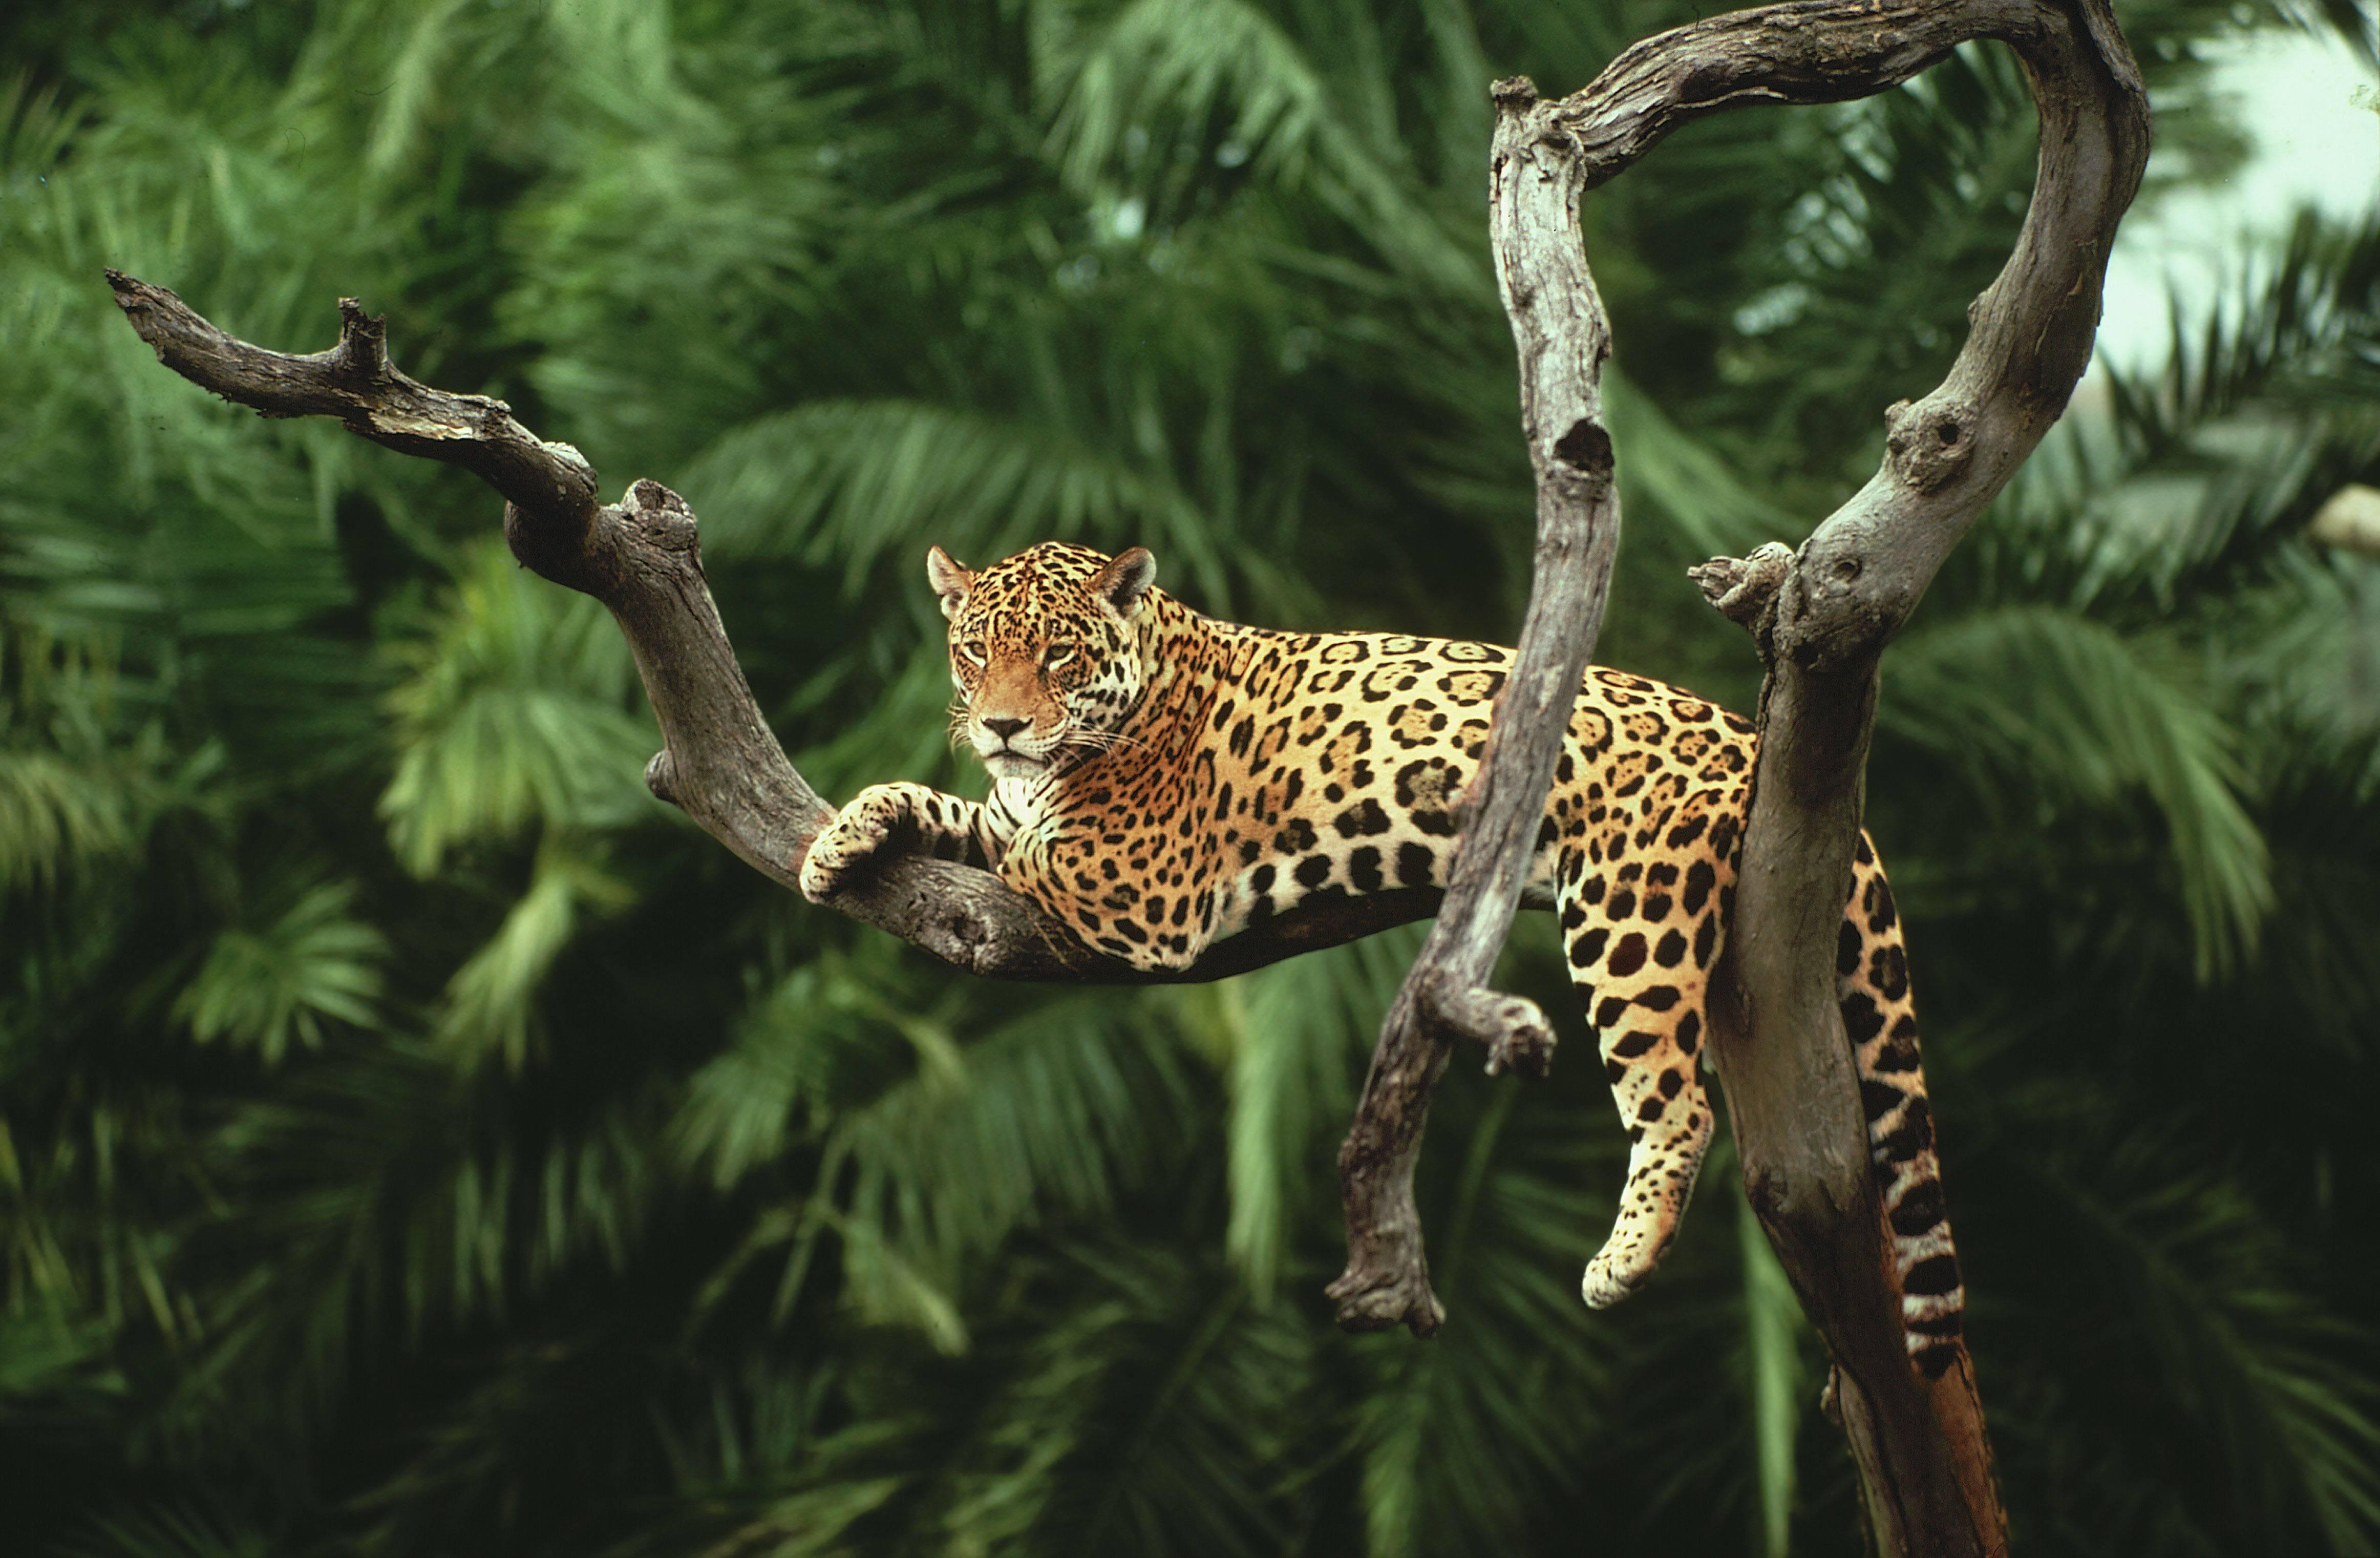 Jaguar Wallpaper Pc Jaguar Pictures Ll Rainforest Animals 4648x3042 Wallpaper Teahub Io